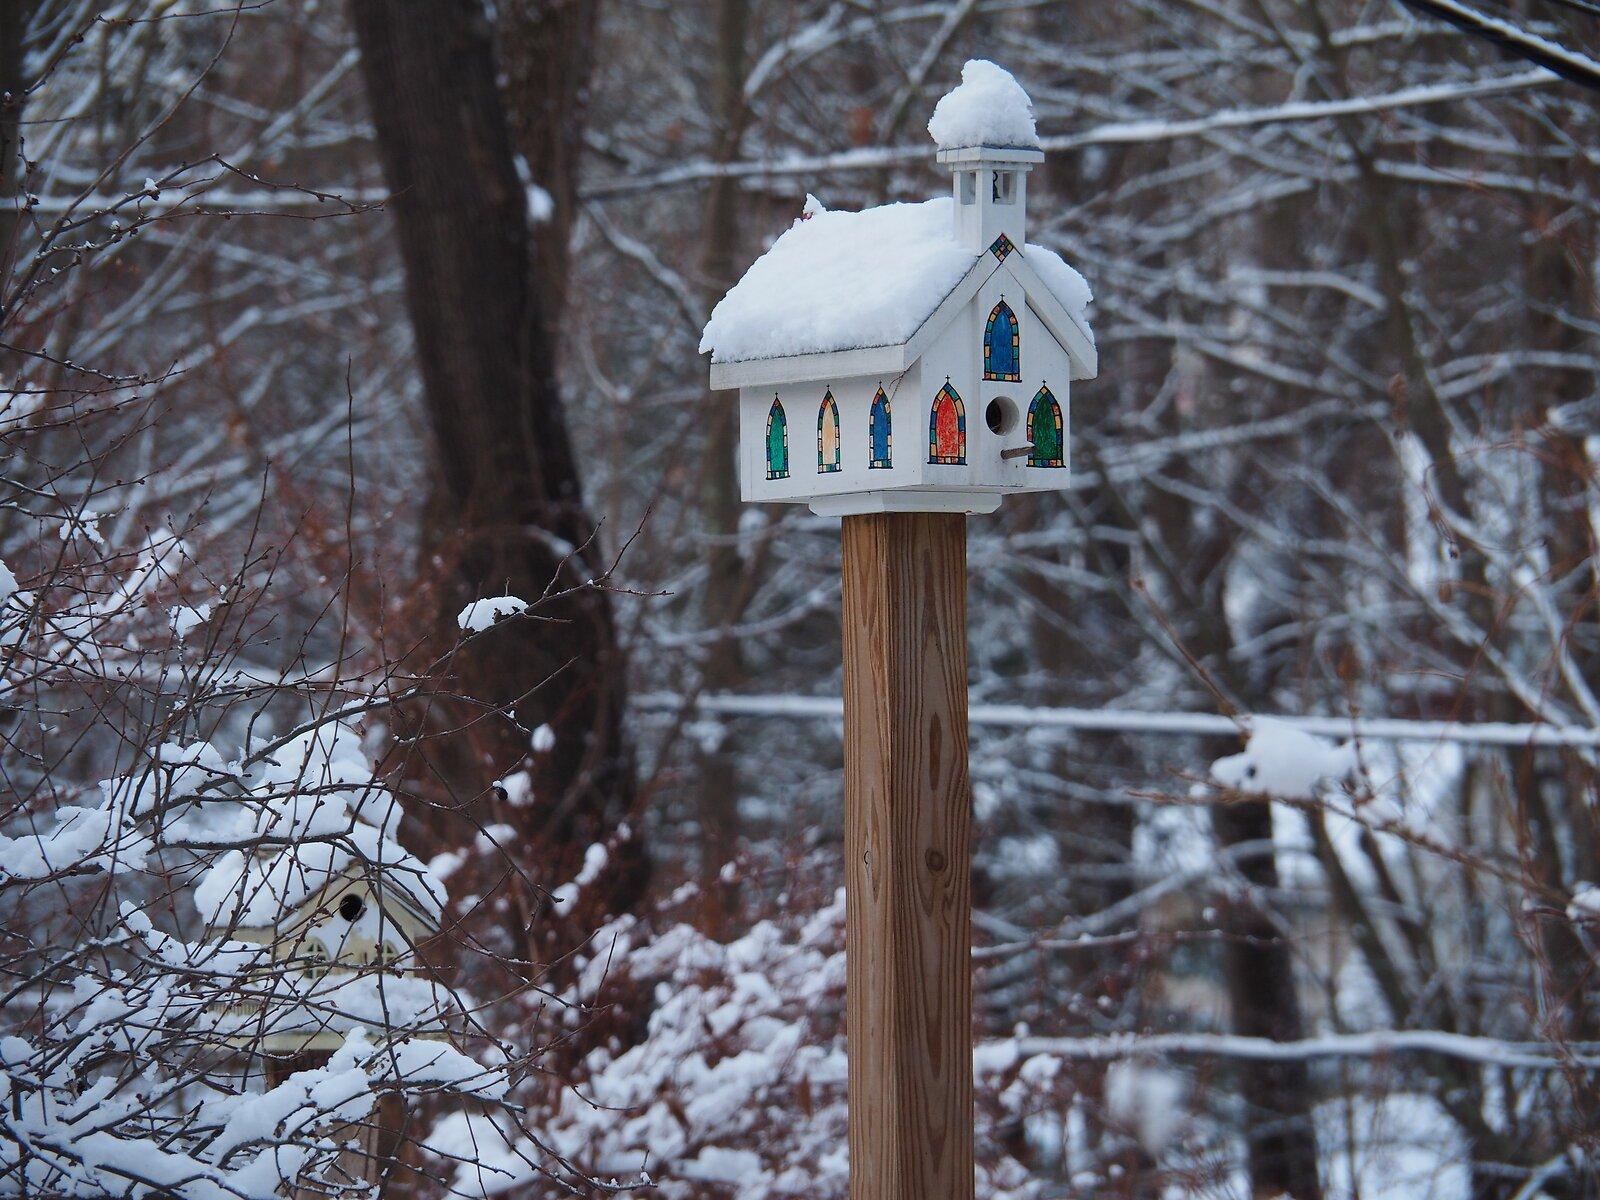 M1 Dec 26 snow 003.JPG